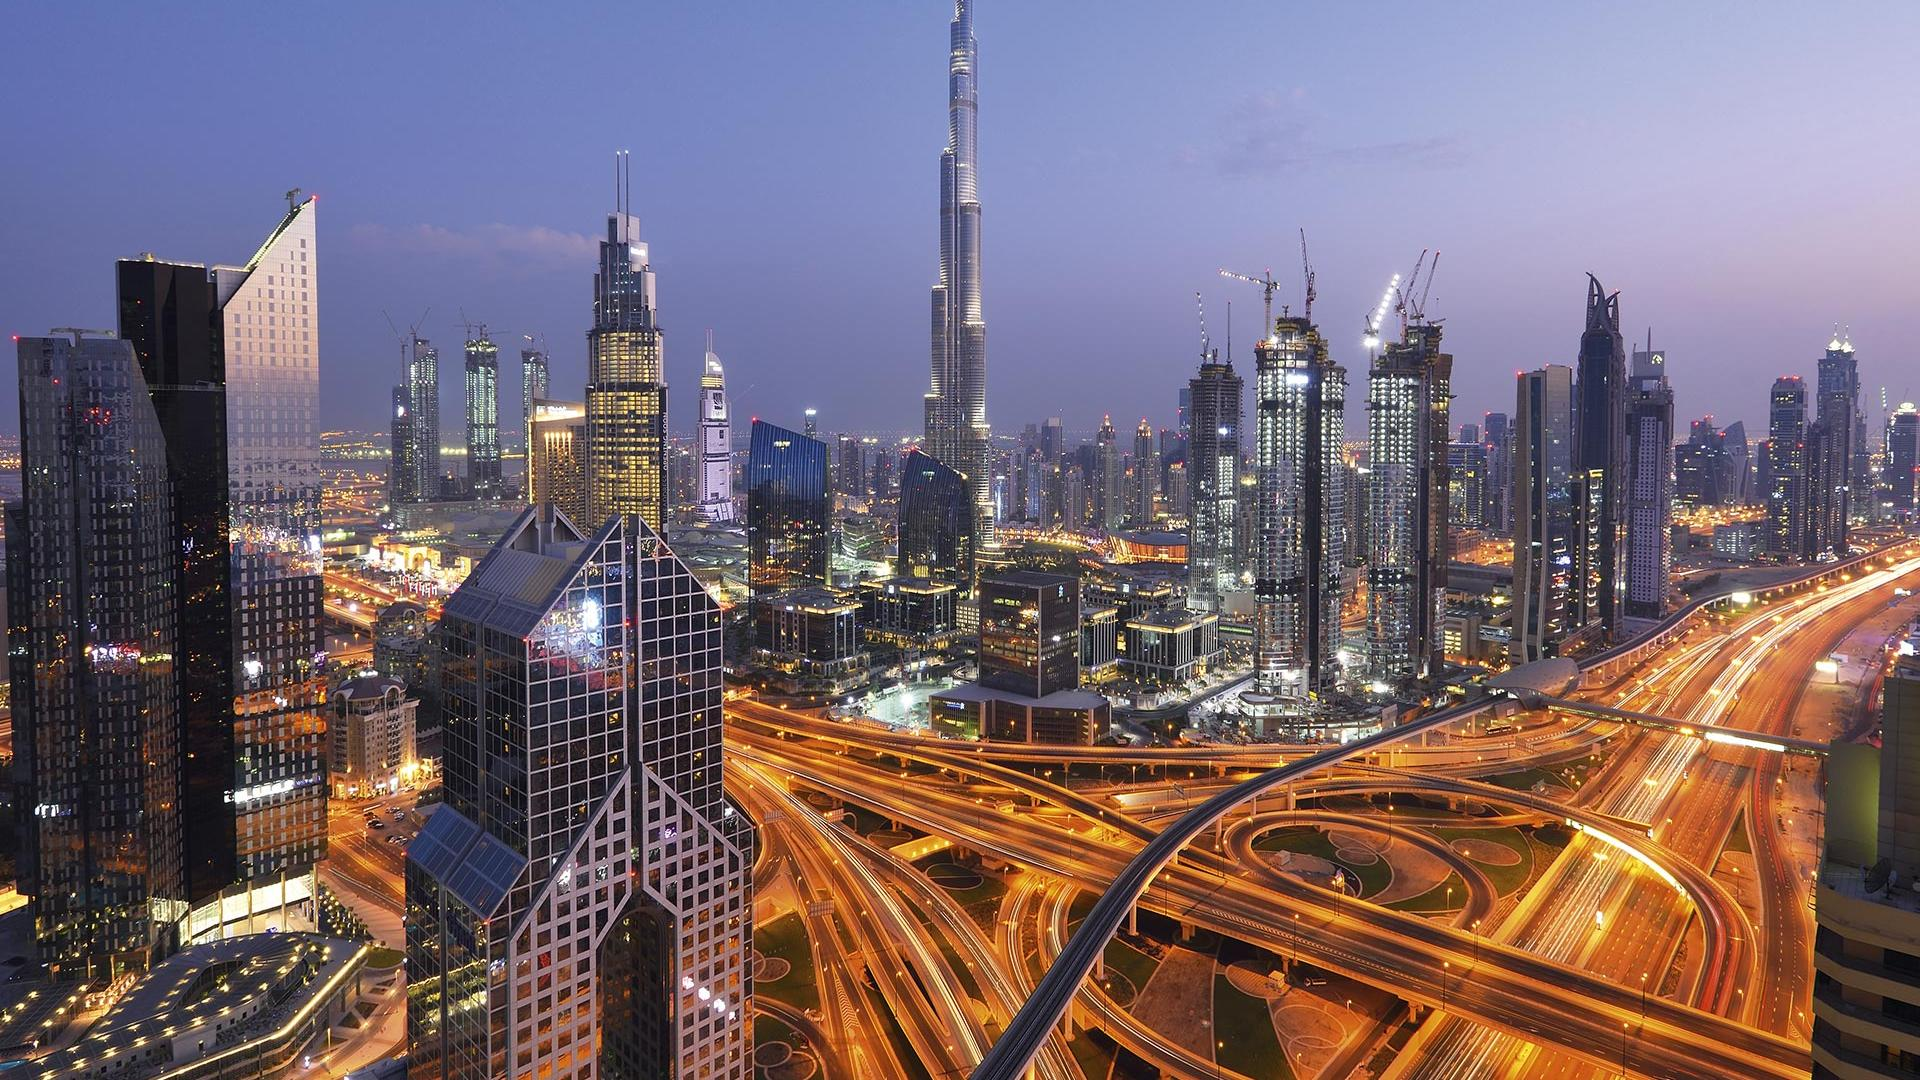 Dubai skyline, including Burj Khalifa